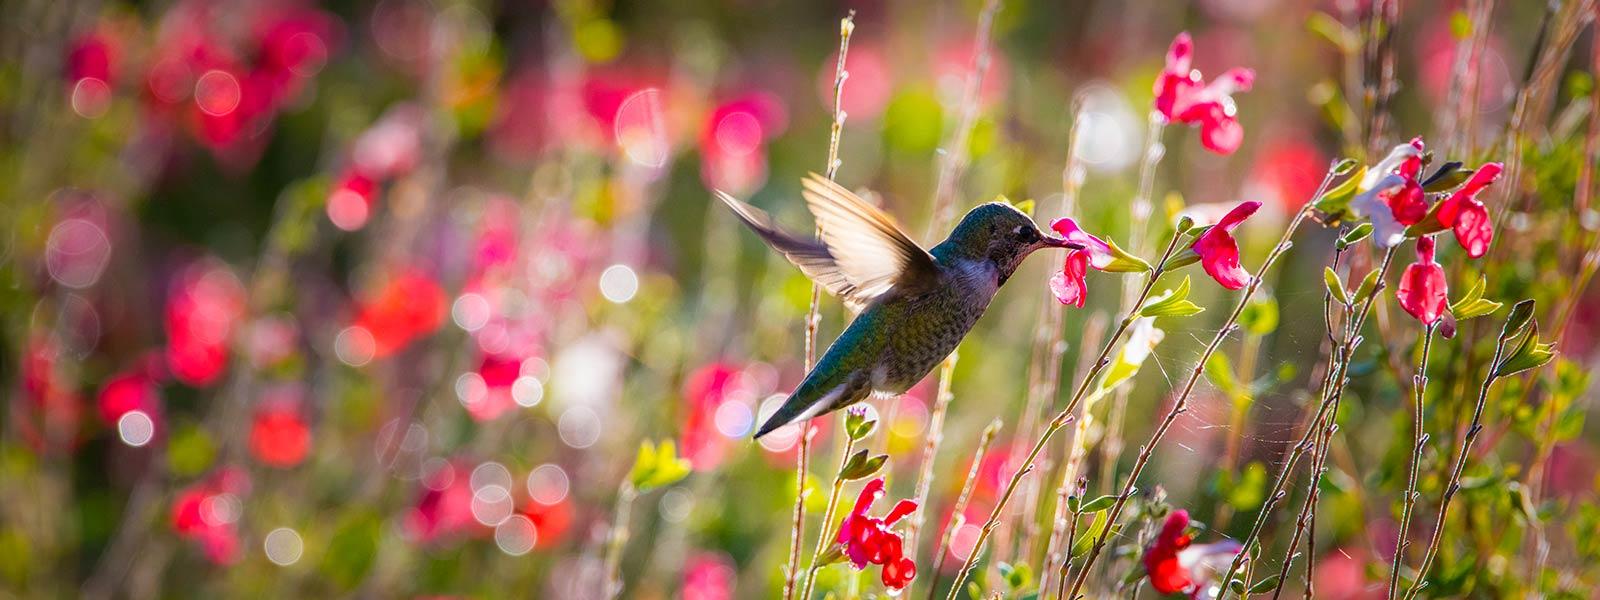 Hummingbird at EcoTerra's pollinator garden